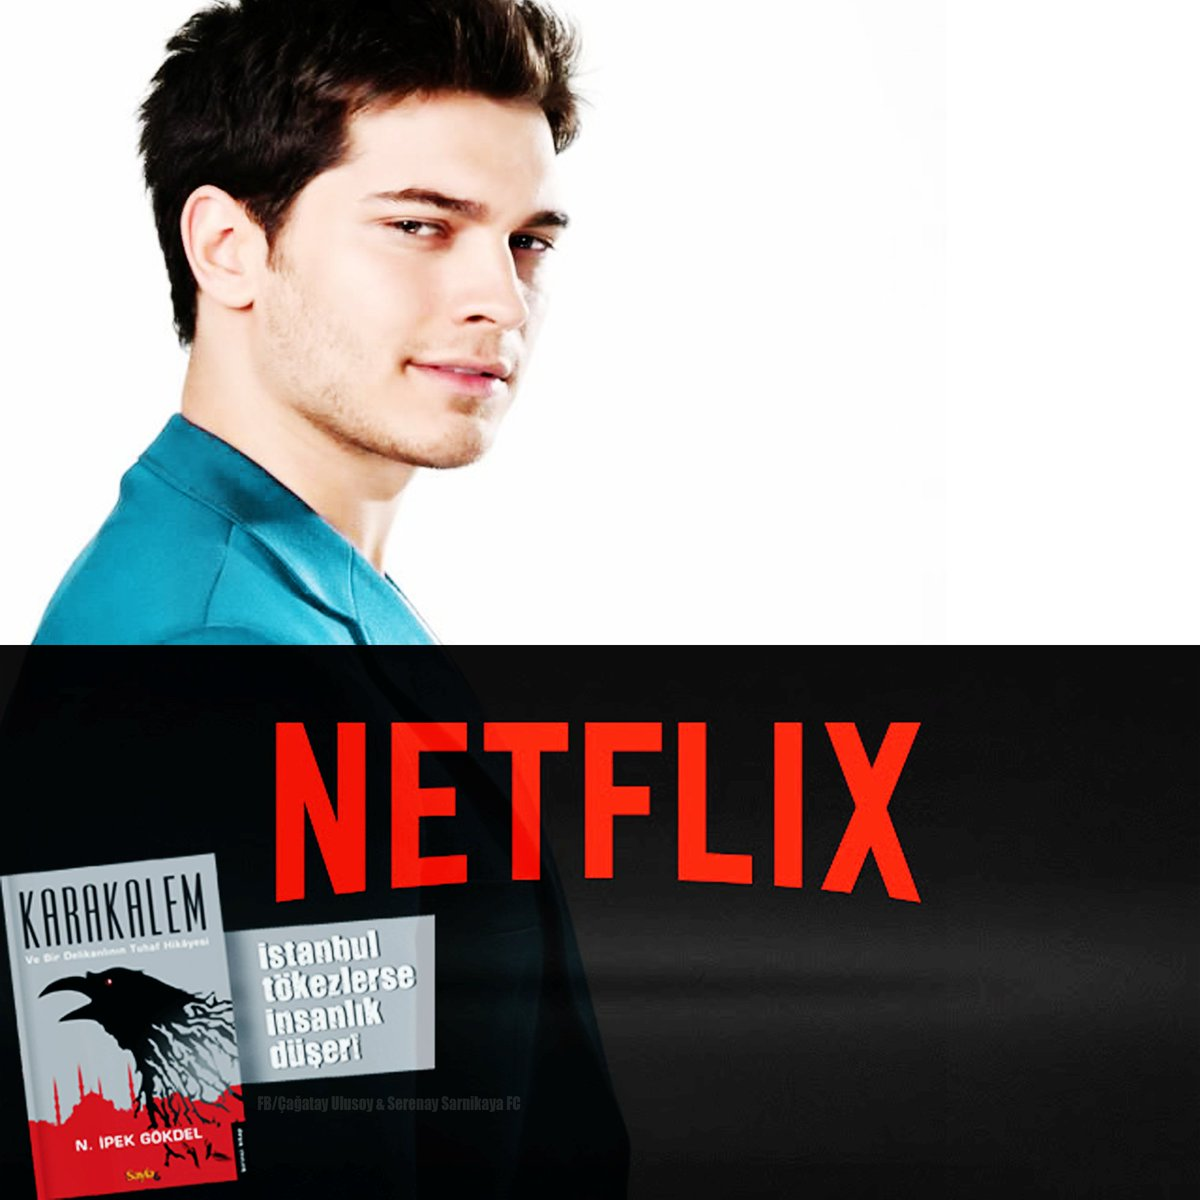 New series Netflix based on the book #Karakalem  Çağatay Ulusoy project began filming in December /17  #ÇağatayUlusoy #Netflix <br>http://pic.twitter.com/45AglcqXEl